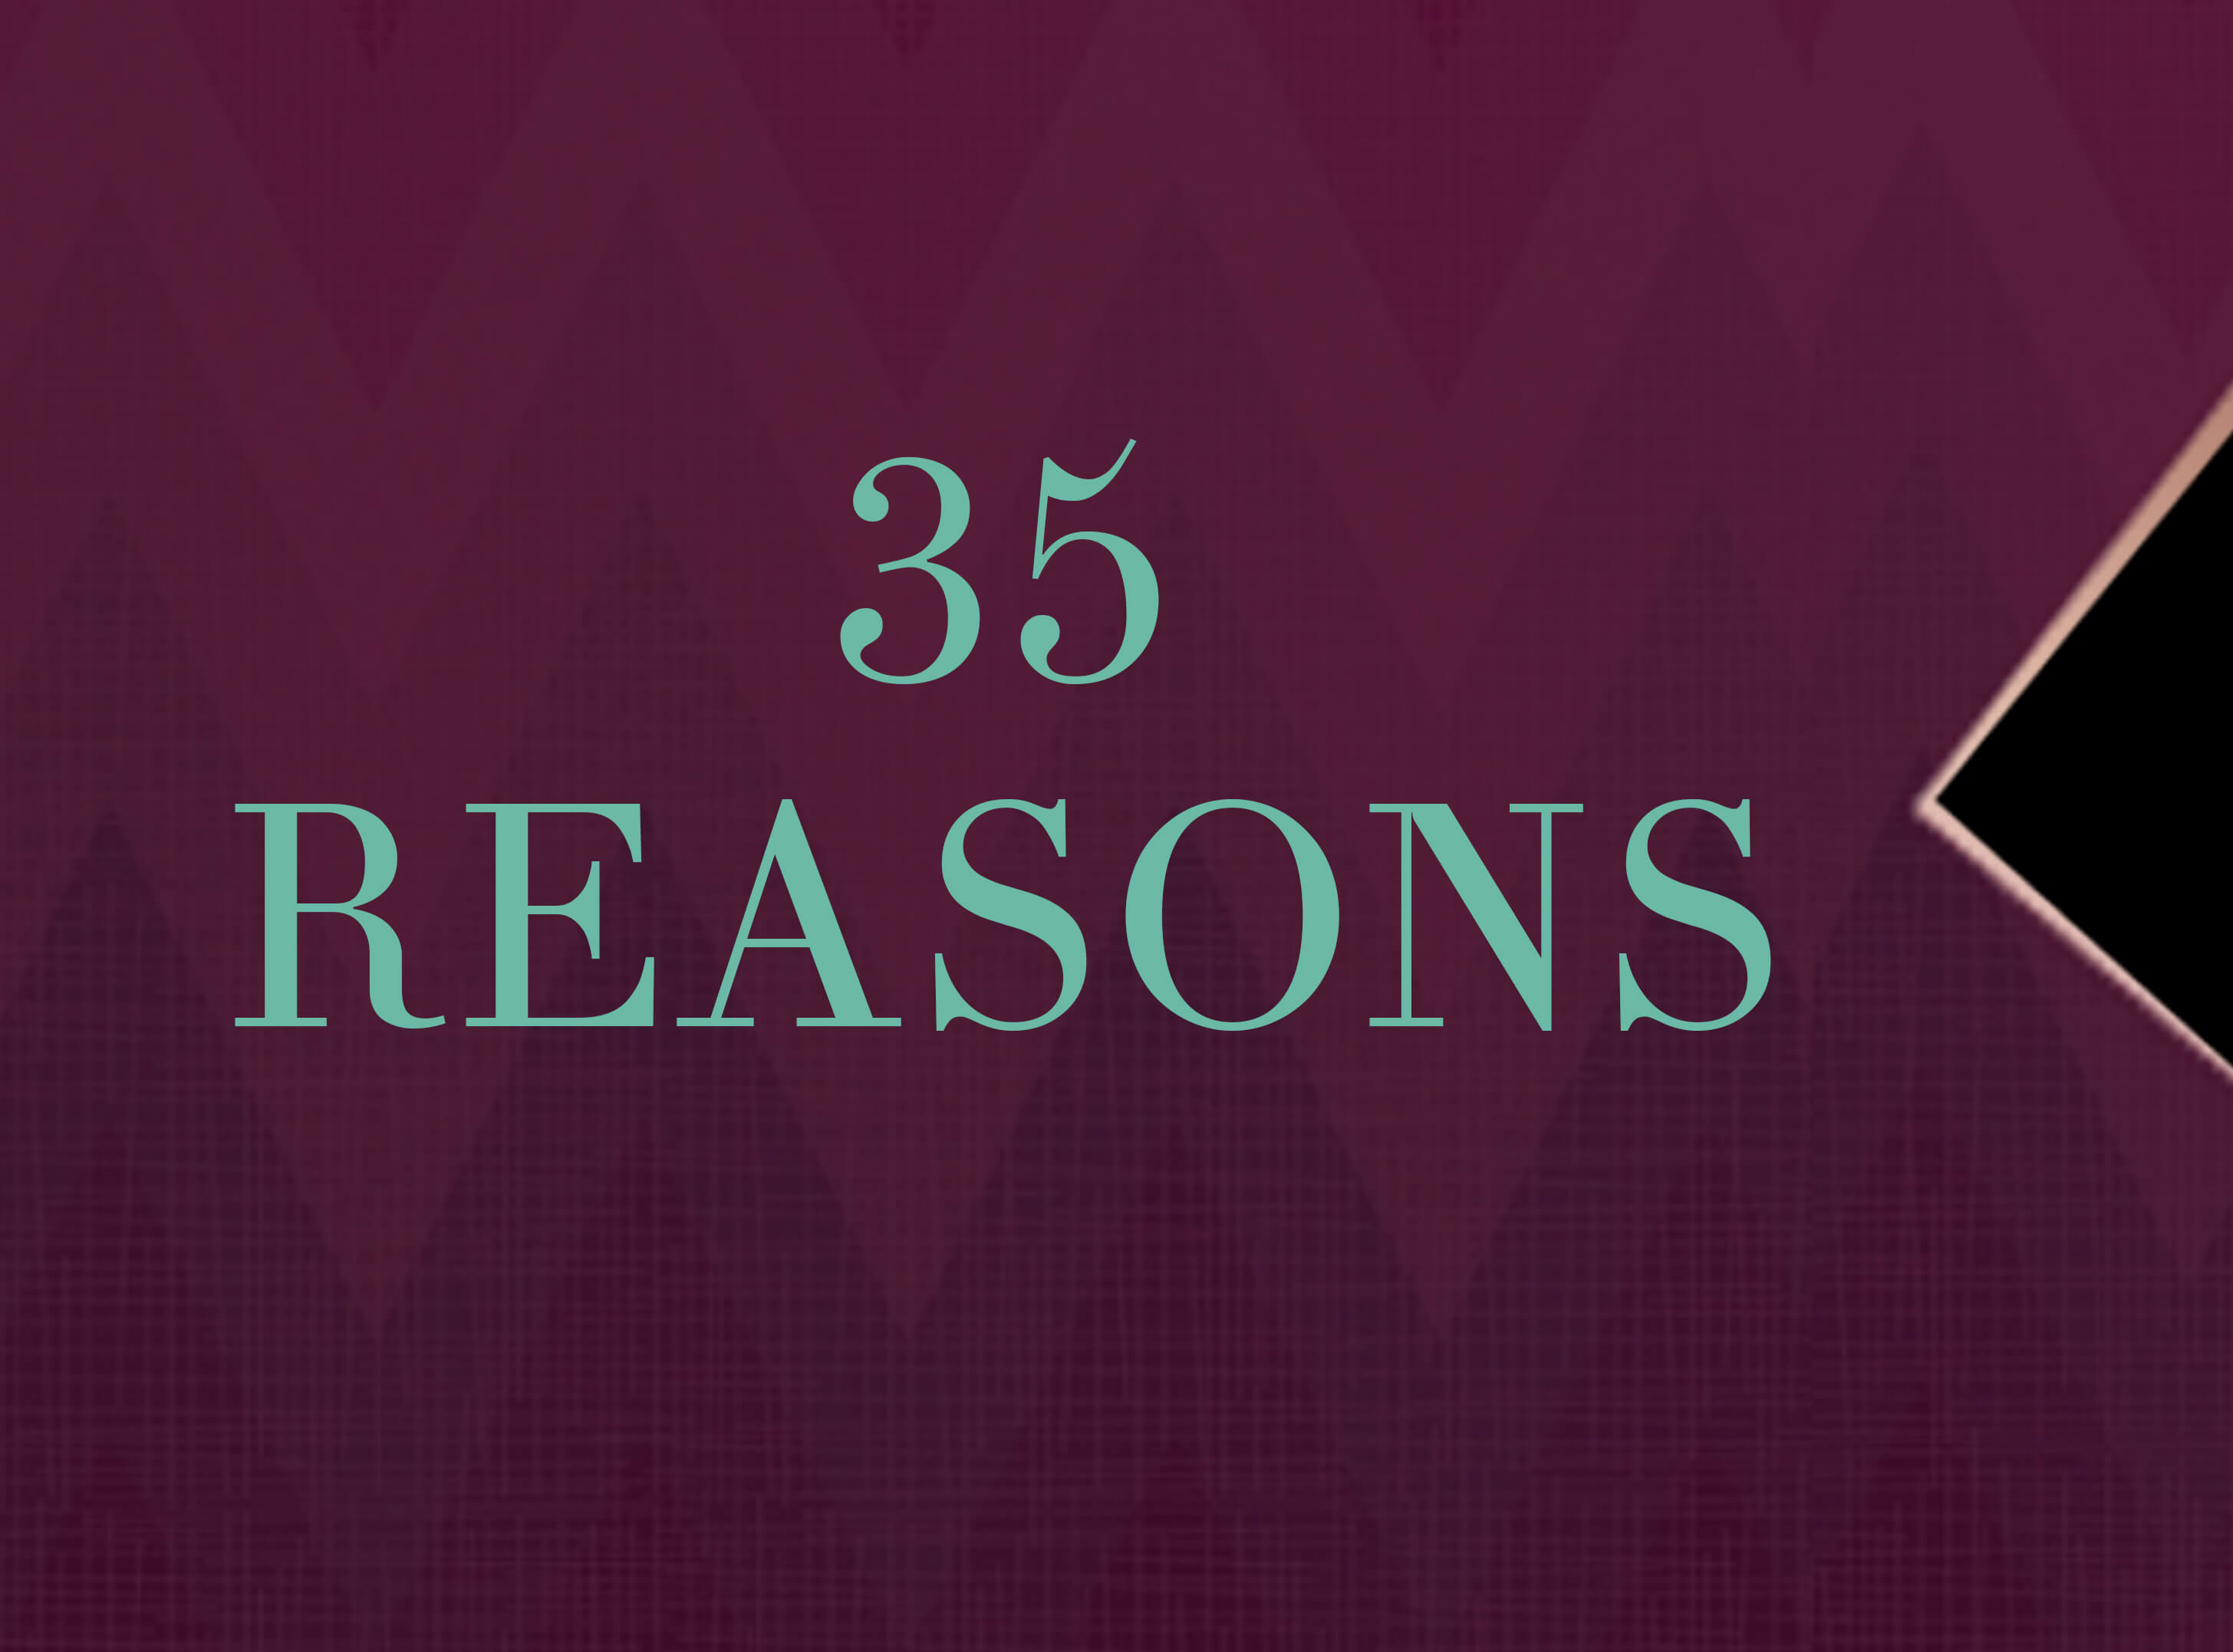 35 Reasons